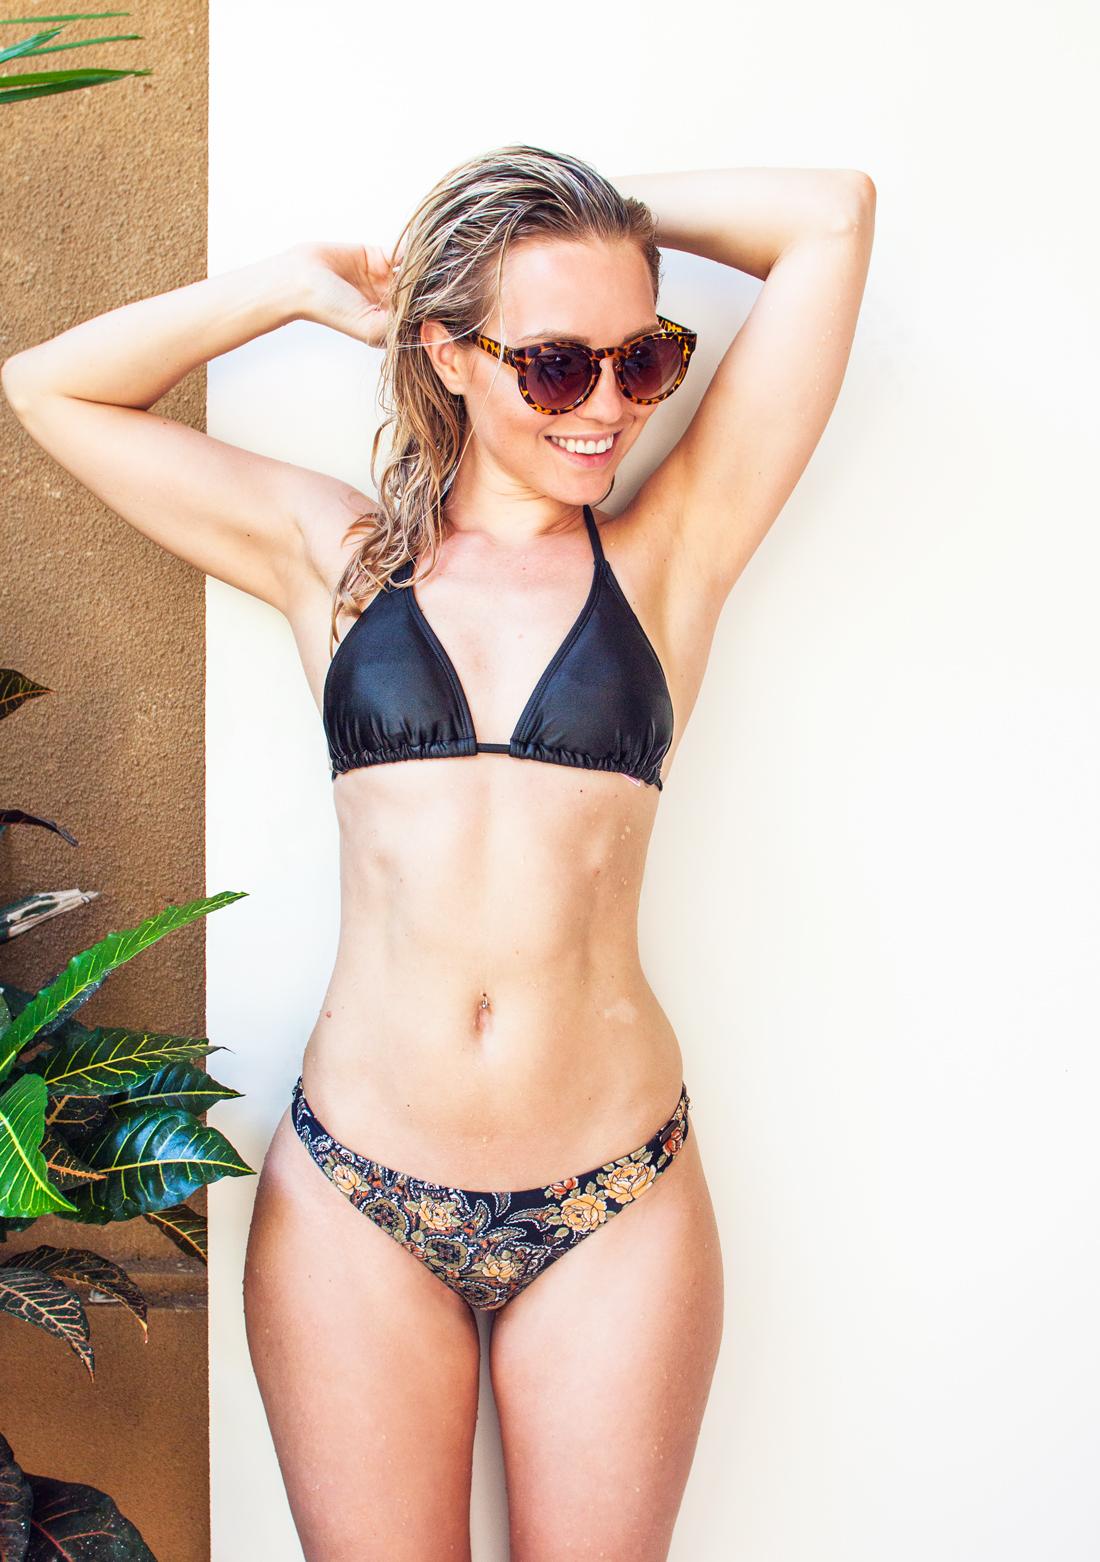 2chilliesbikini, 2 chillies waikiki bottoms, bikini, ubud villa, bali vacation, cheeky bikini bottoms, fit, leopard sunglasses, leopard sunnies, abs, 2chillies triangle top, australian bikini brand